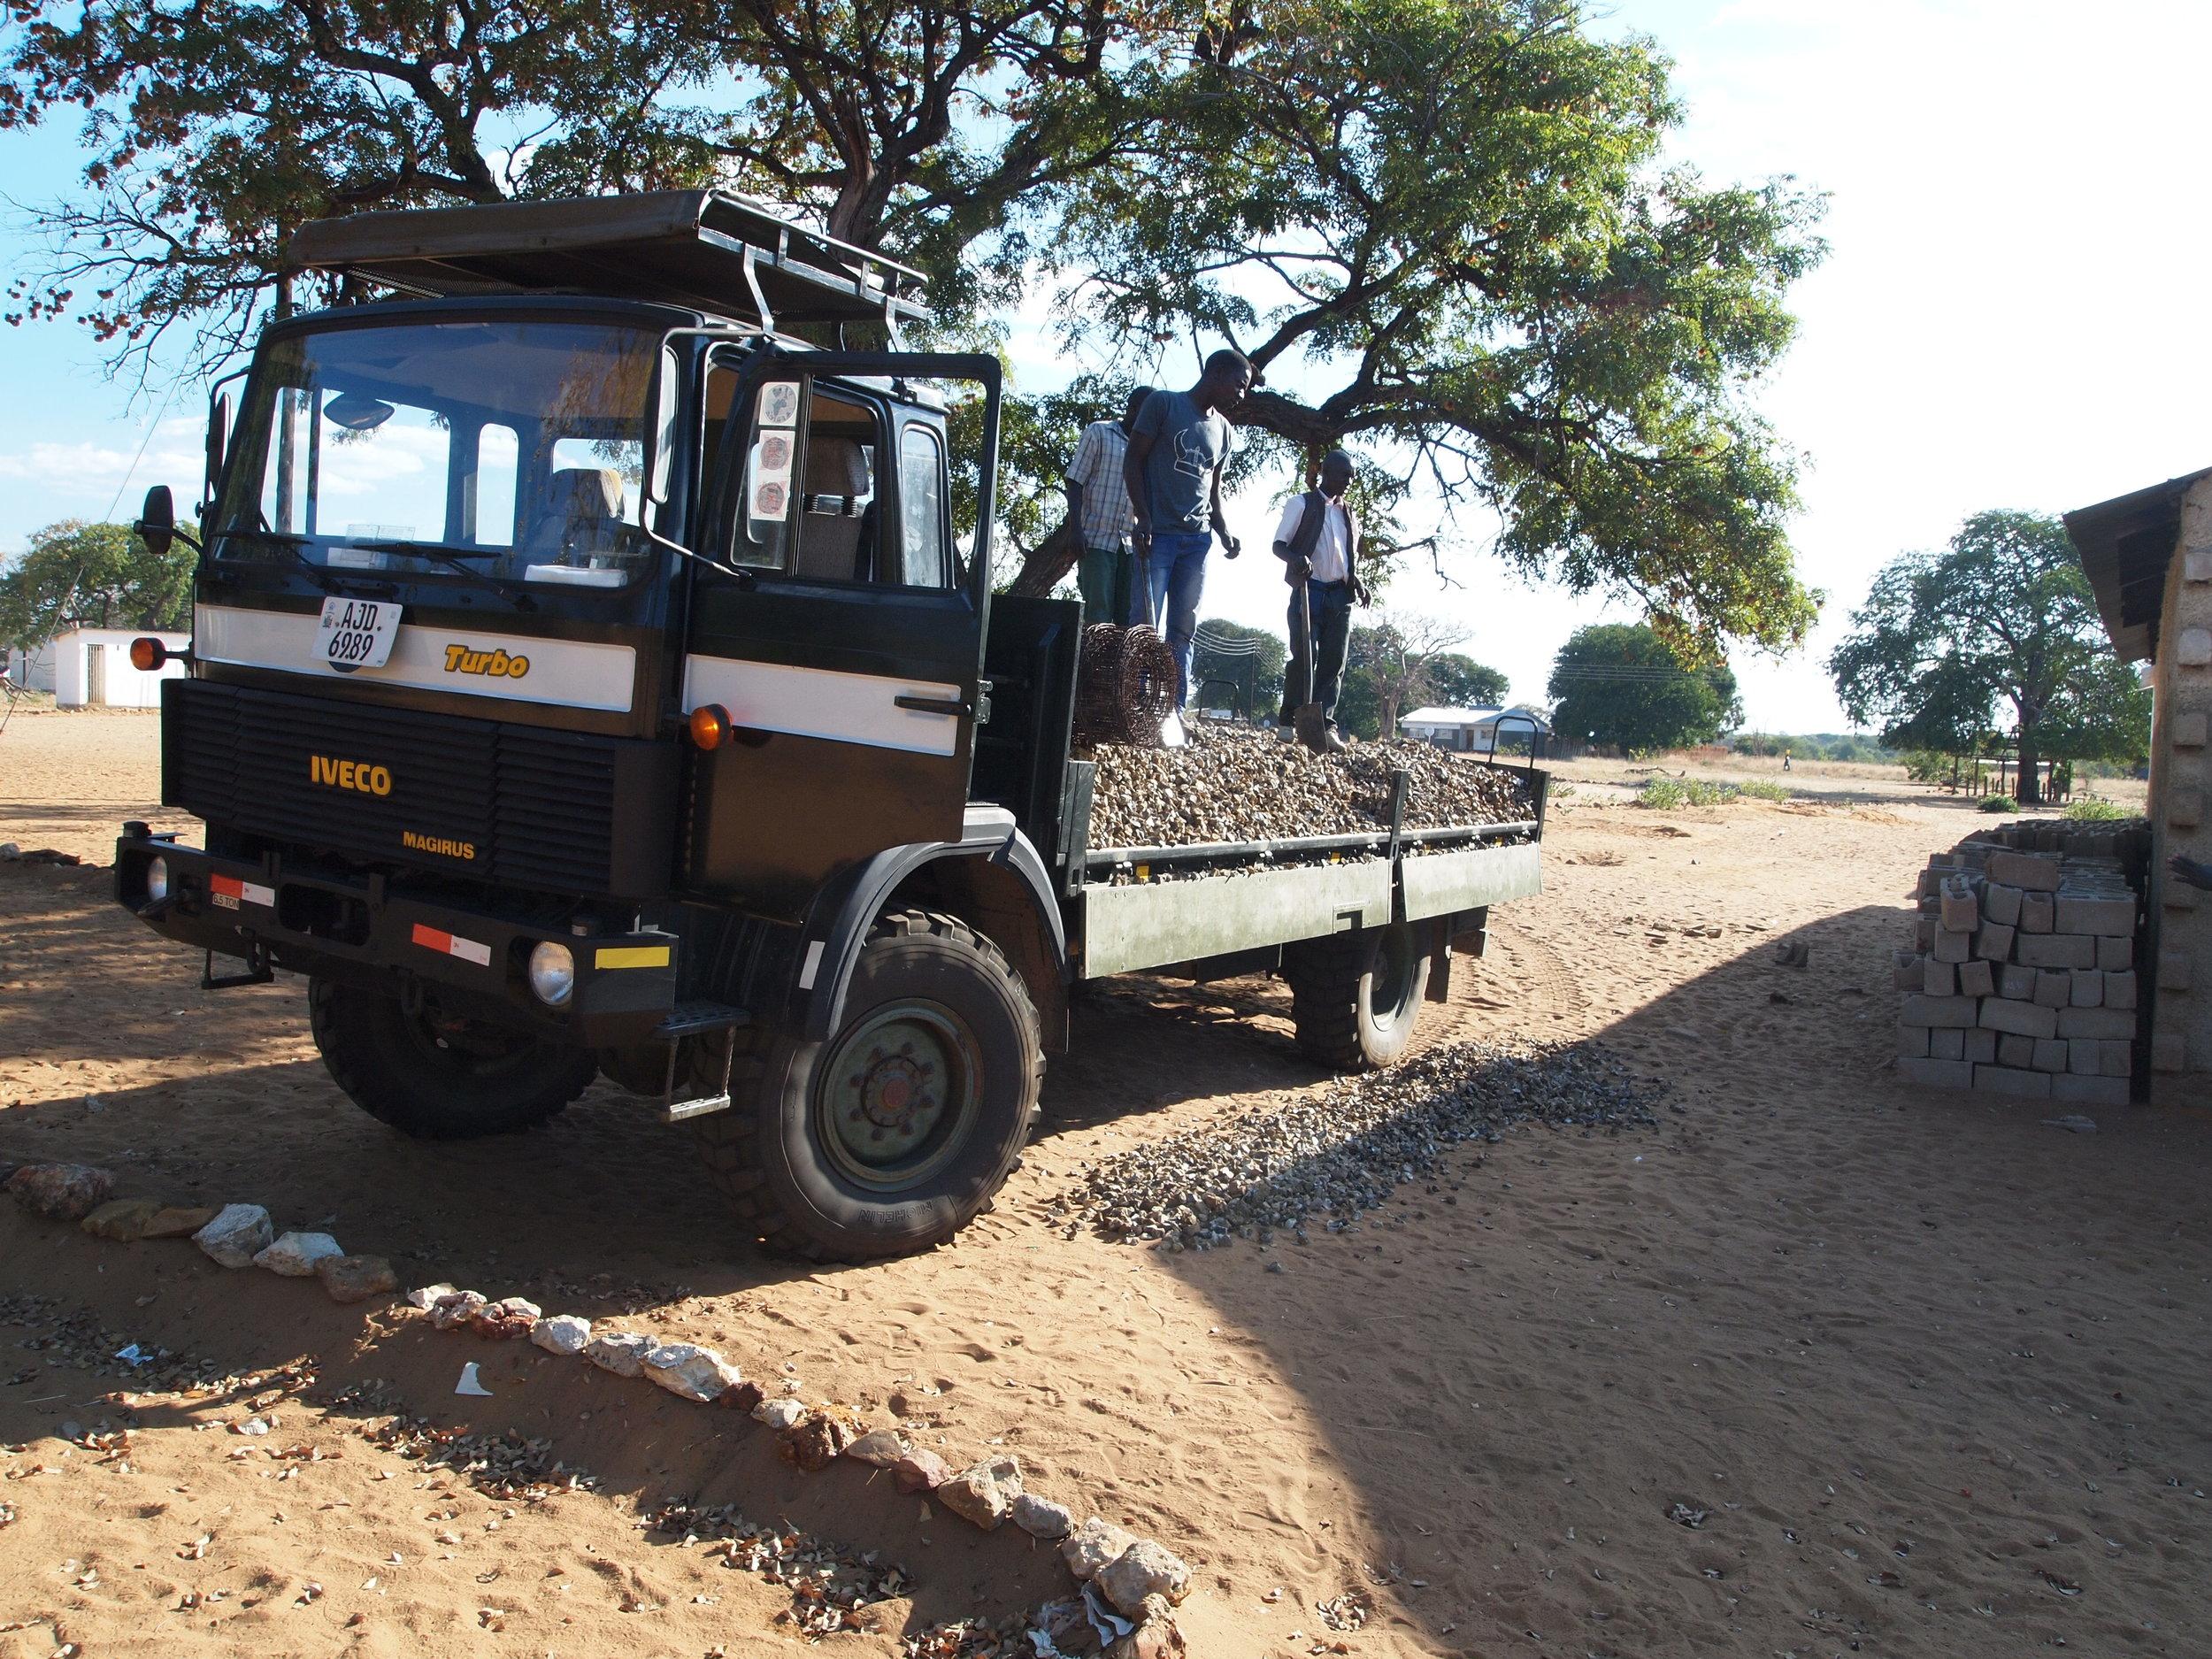 Delivering stones for a building foundation